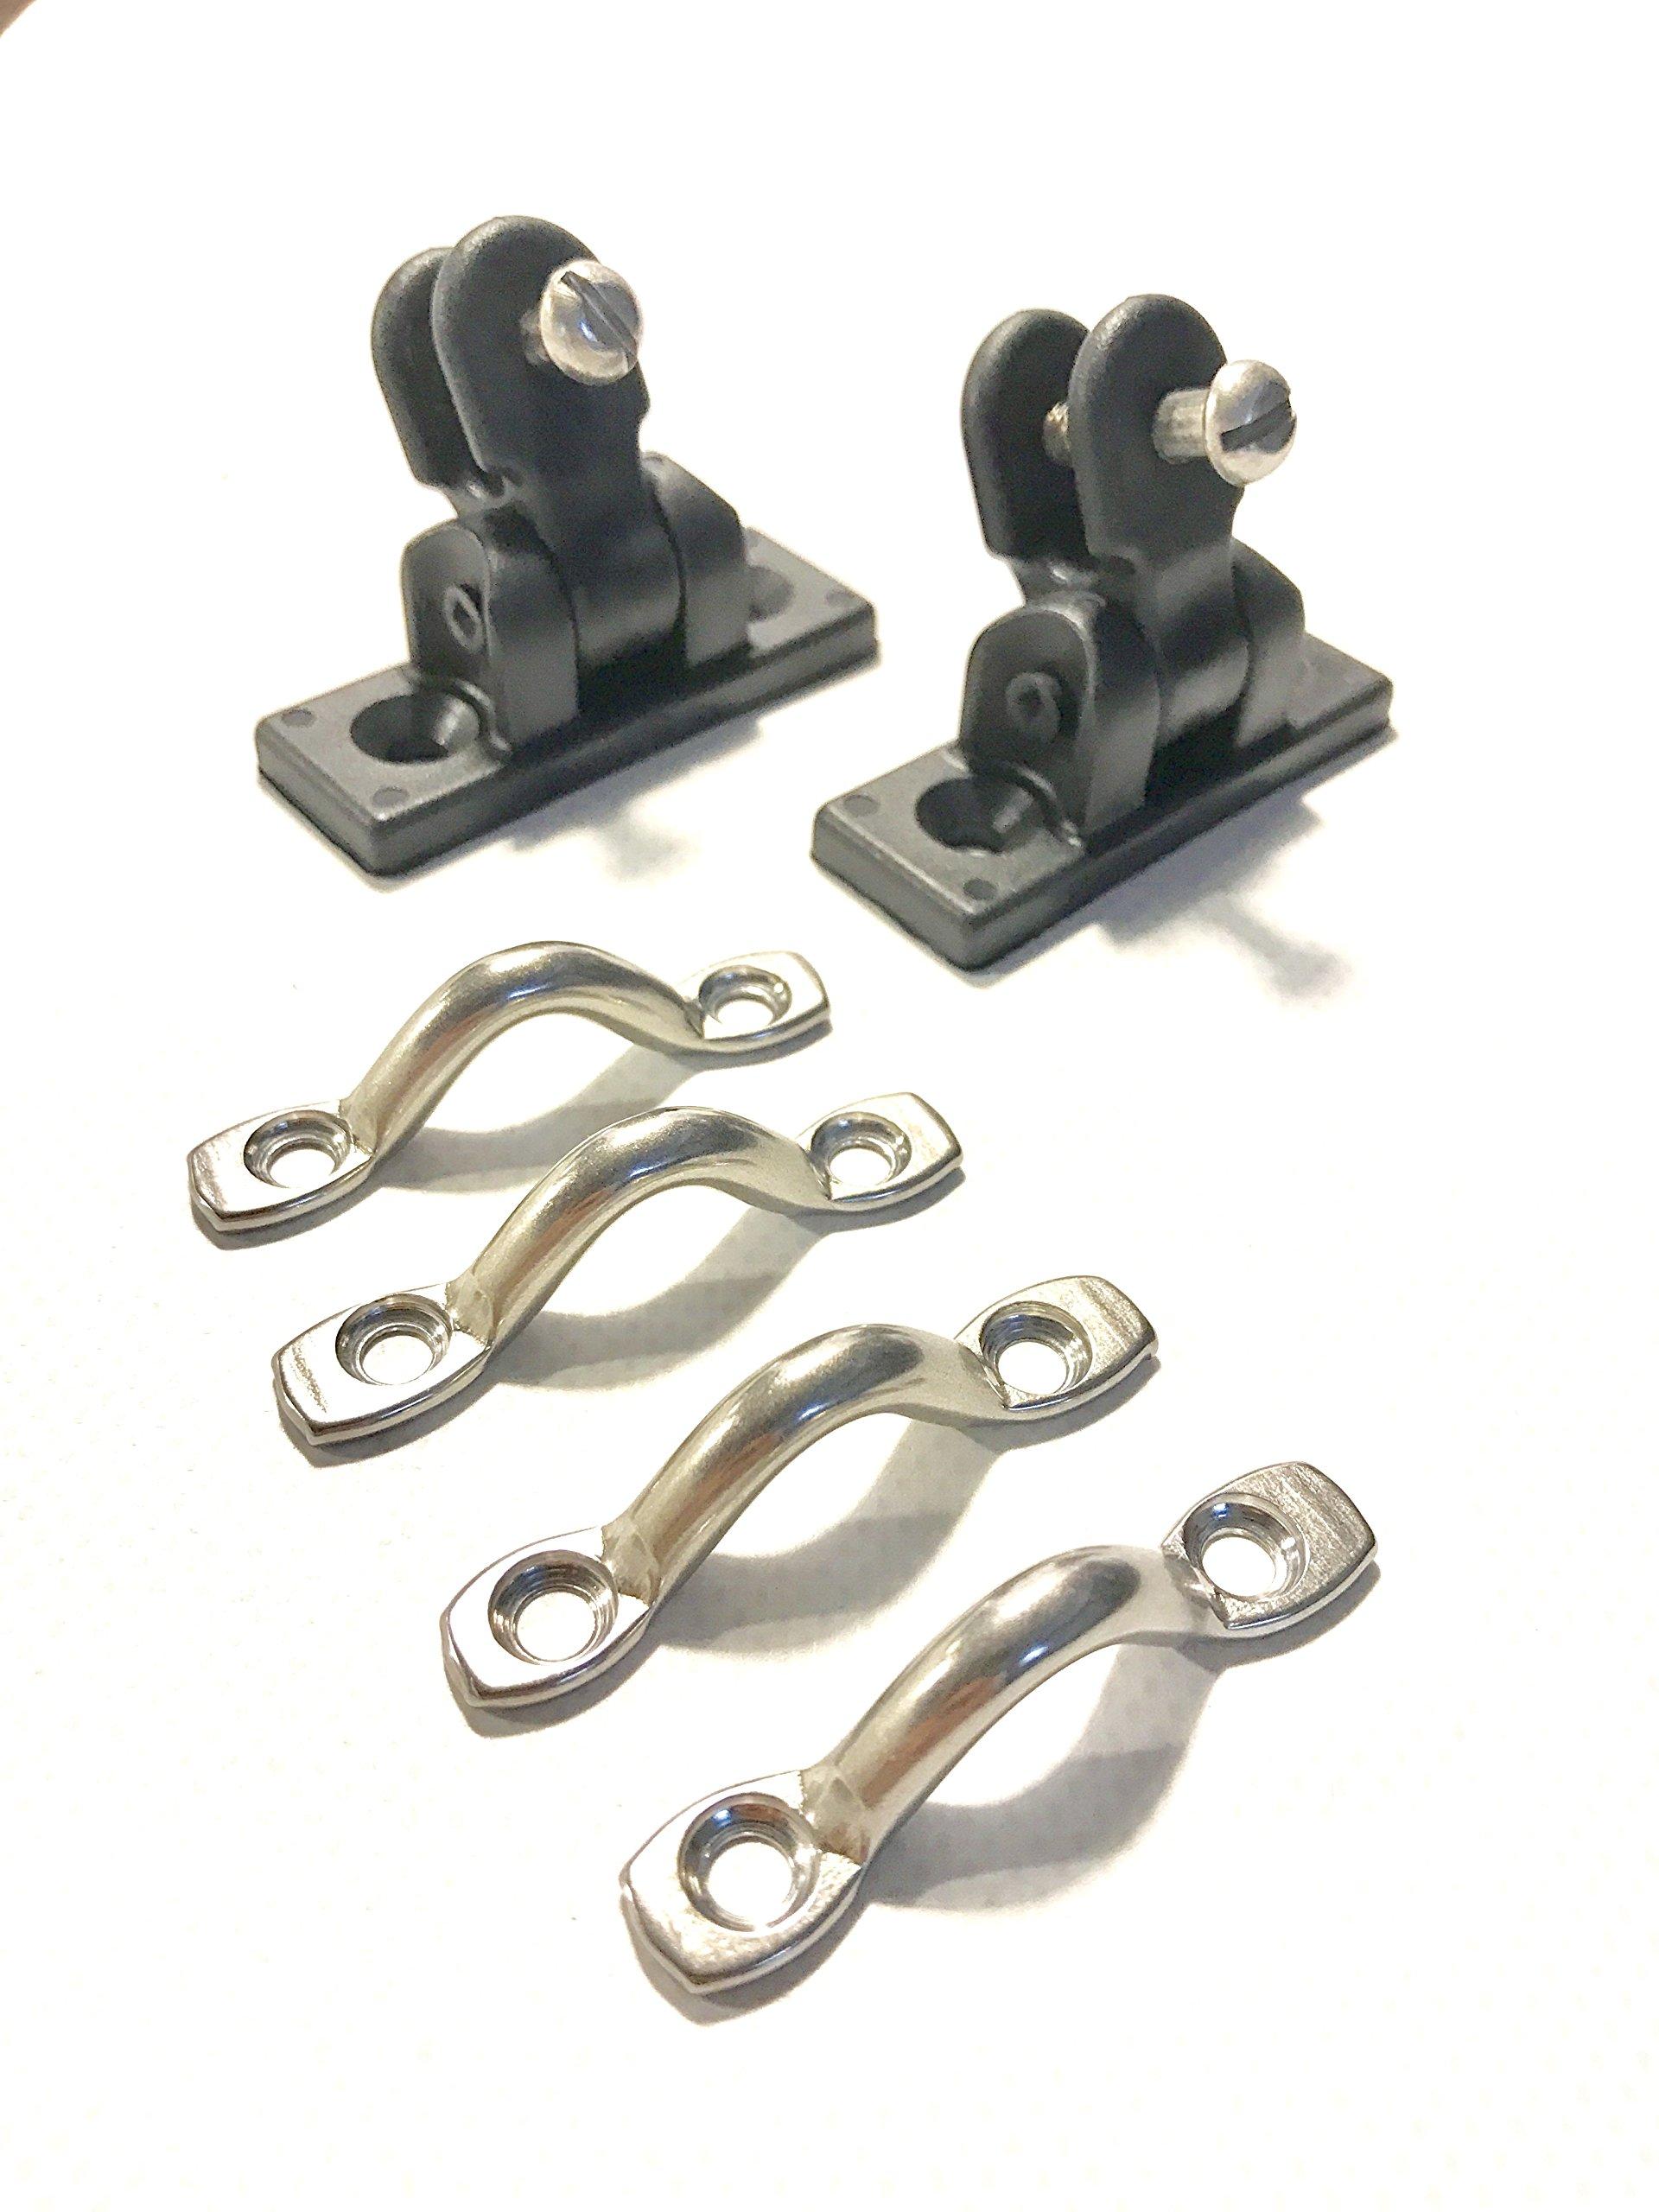 1//4x3 In Strong-Tie Split Drive Anchor CSD25300-G100 PK100